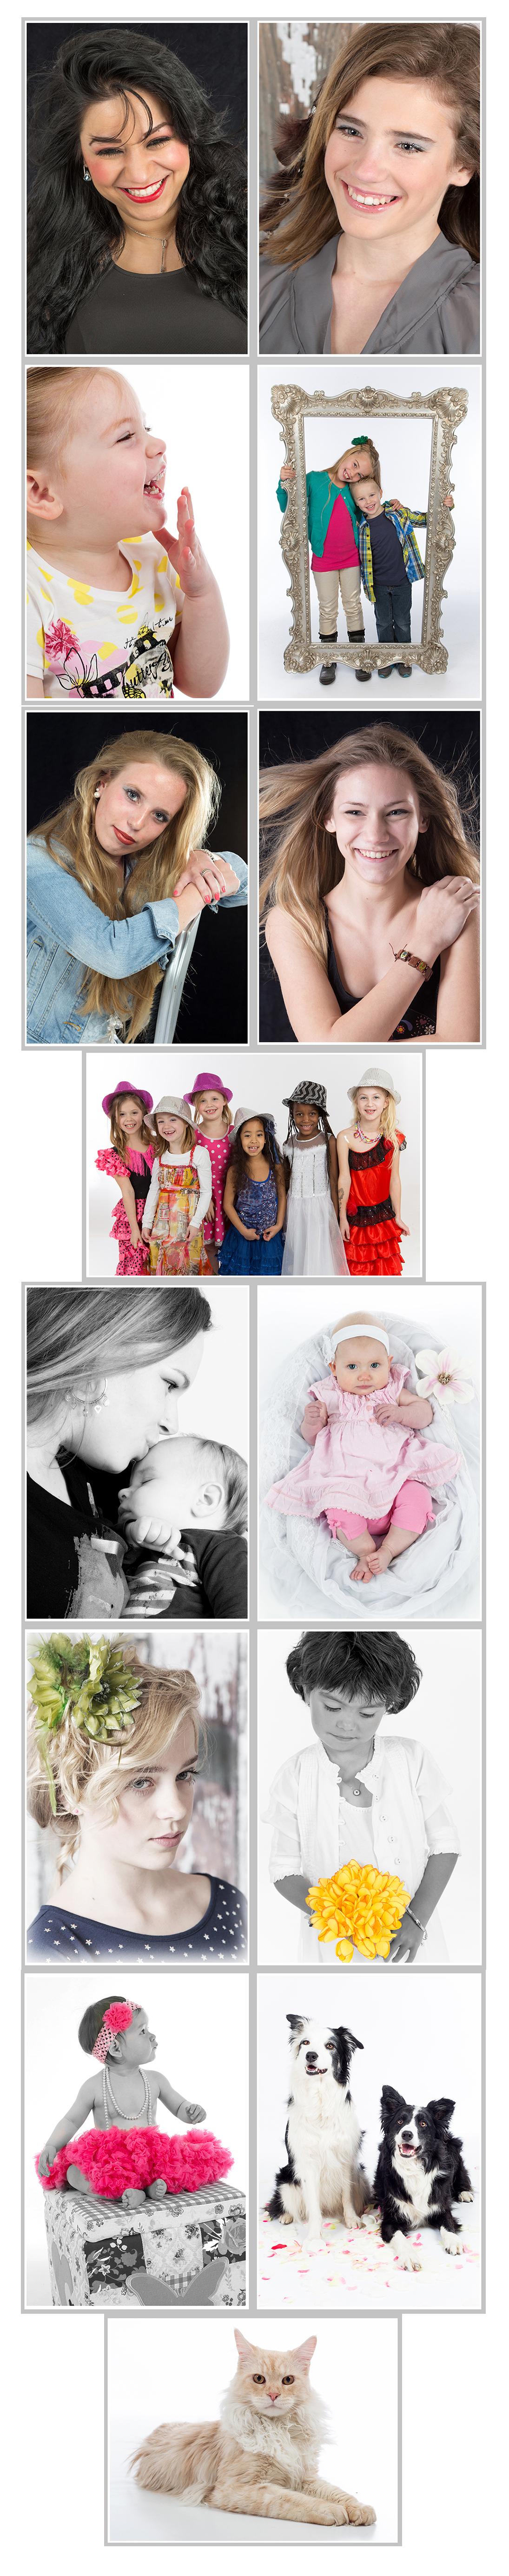 Portretfotografie, kinderfotografie, newbornfotografie en huisdierenfotografie Dordrecht